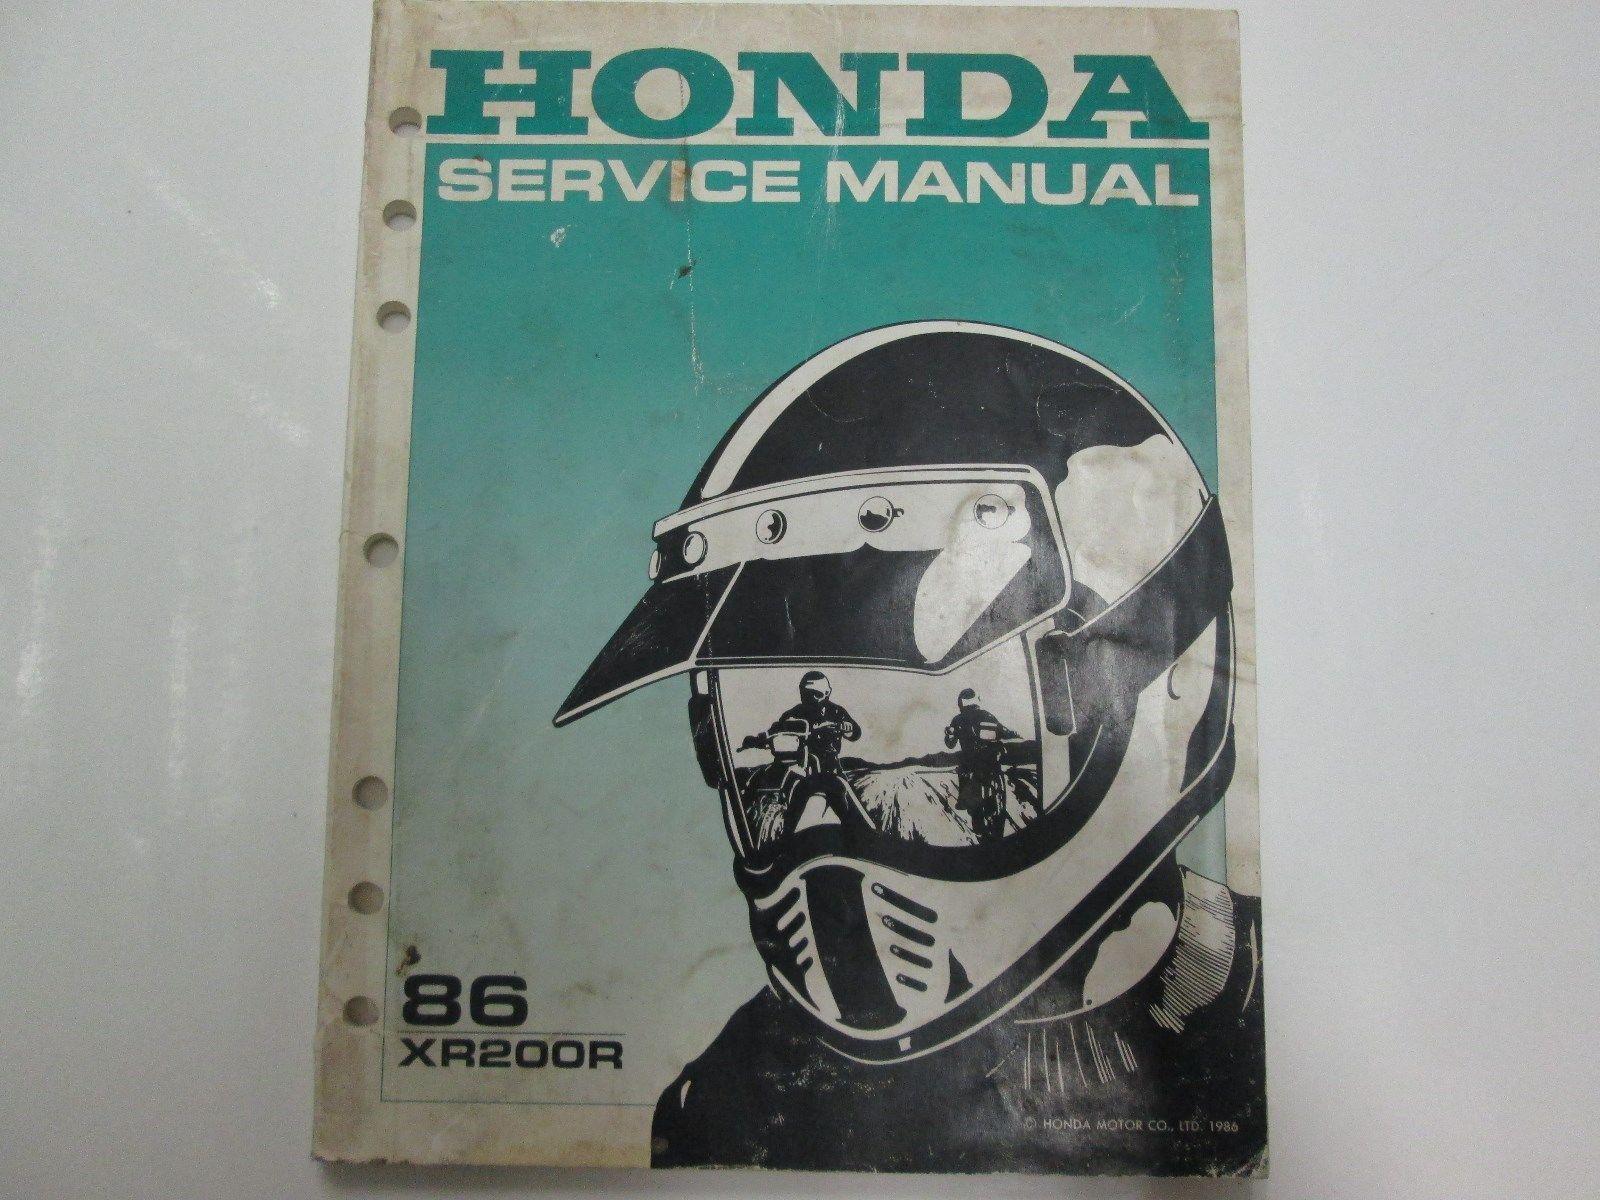 1986 honda xr200r service shop repair manual factory oem for Honda financial services hours